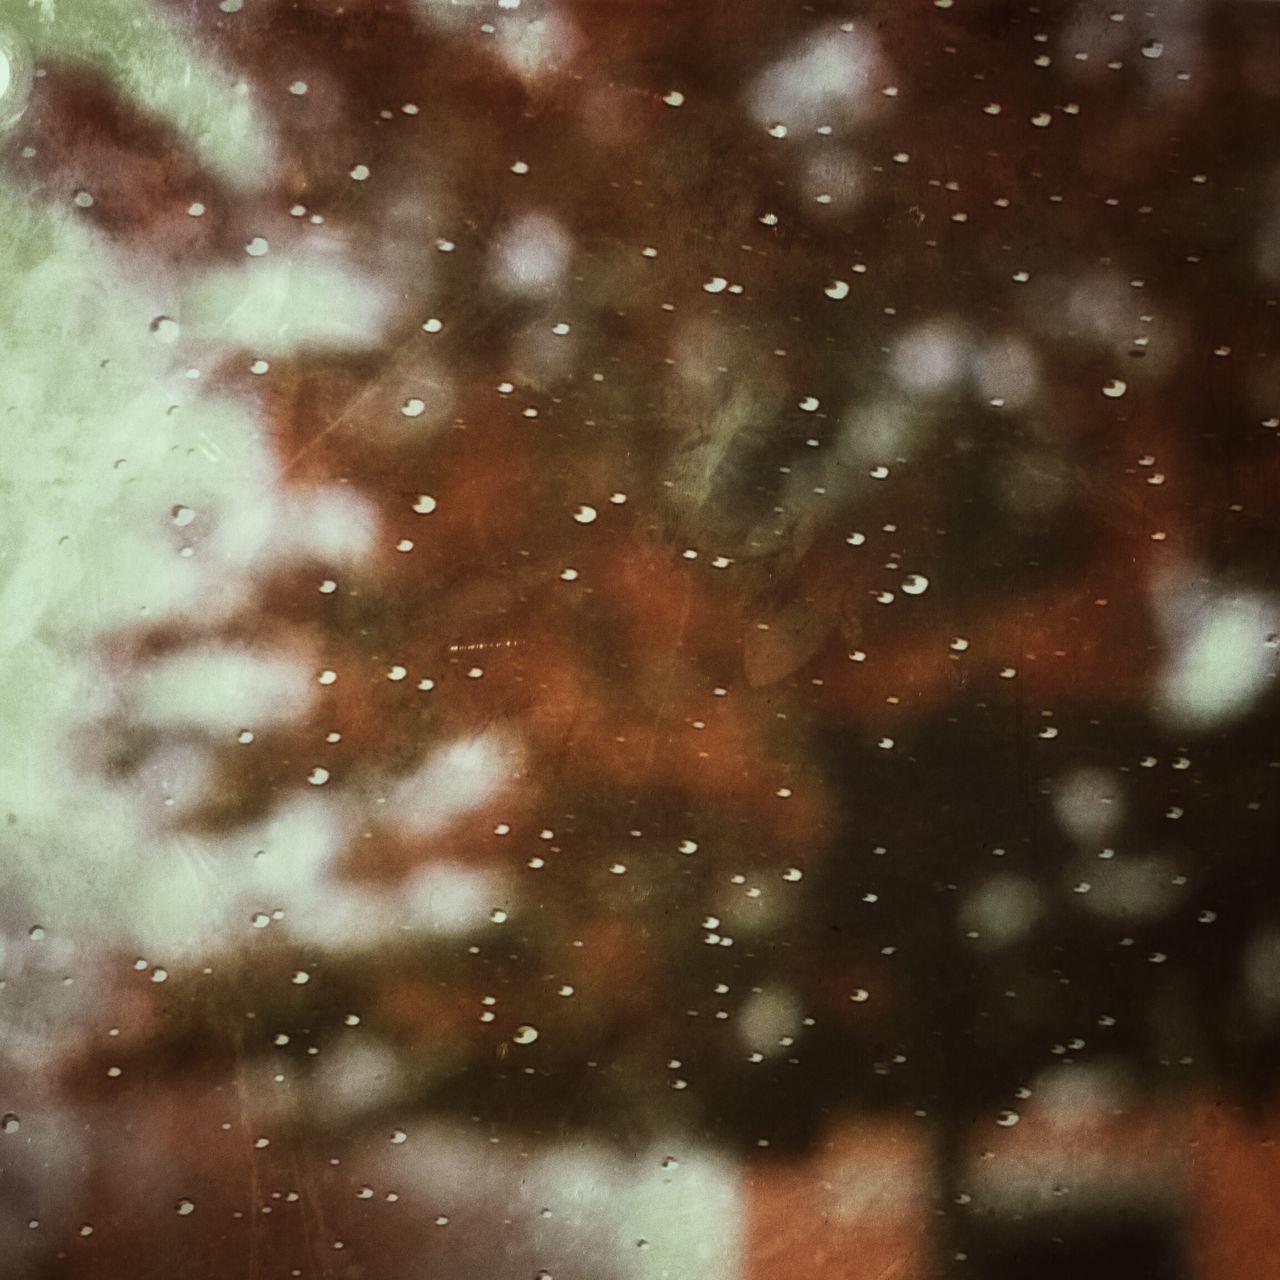 Autumn Blur Drivebyphotography No People Outdoors Rain Raindrops Through The Window Tree